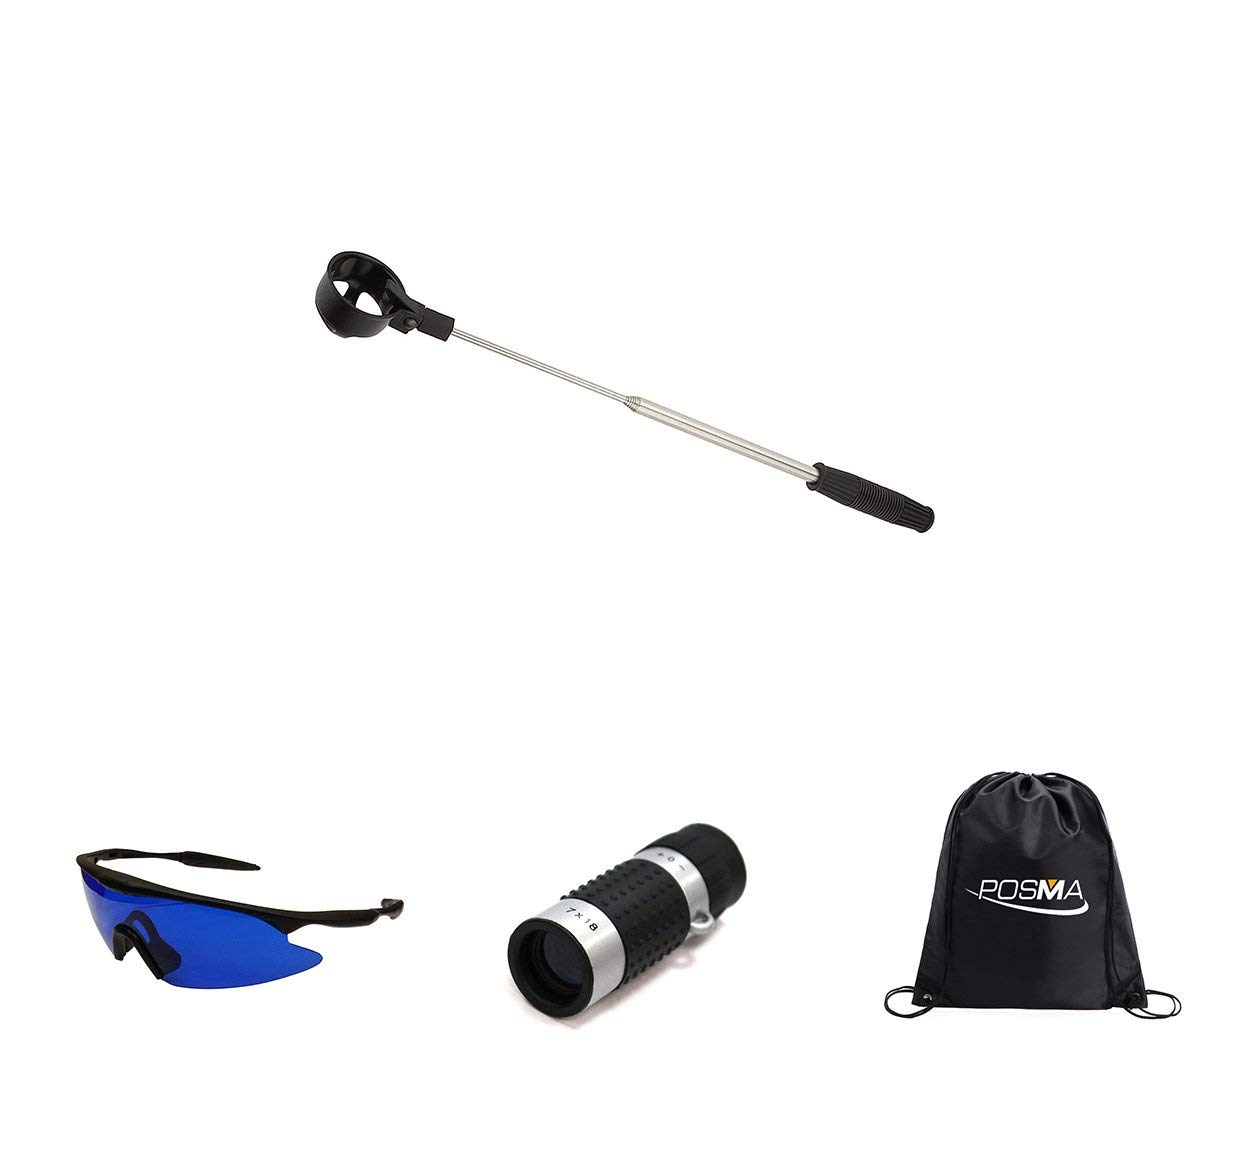 POSMA BR050L Golf 5 section Retrectable 2m Golf Ball Retriever Bundle Set with 1pc Golf Ranger Finder(GF100) + 1pc Golf Ball Finder Hunter Retriever Glasses + 1pc black cinch sack carry bag